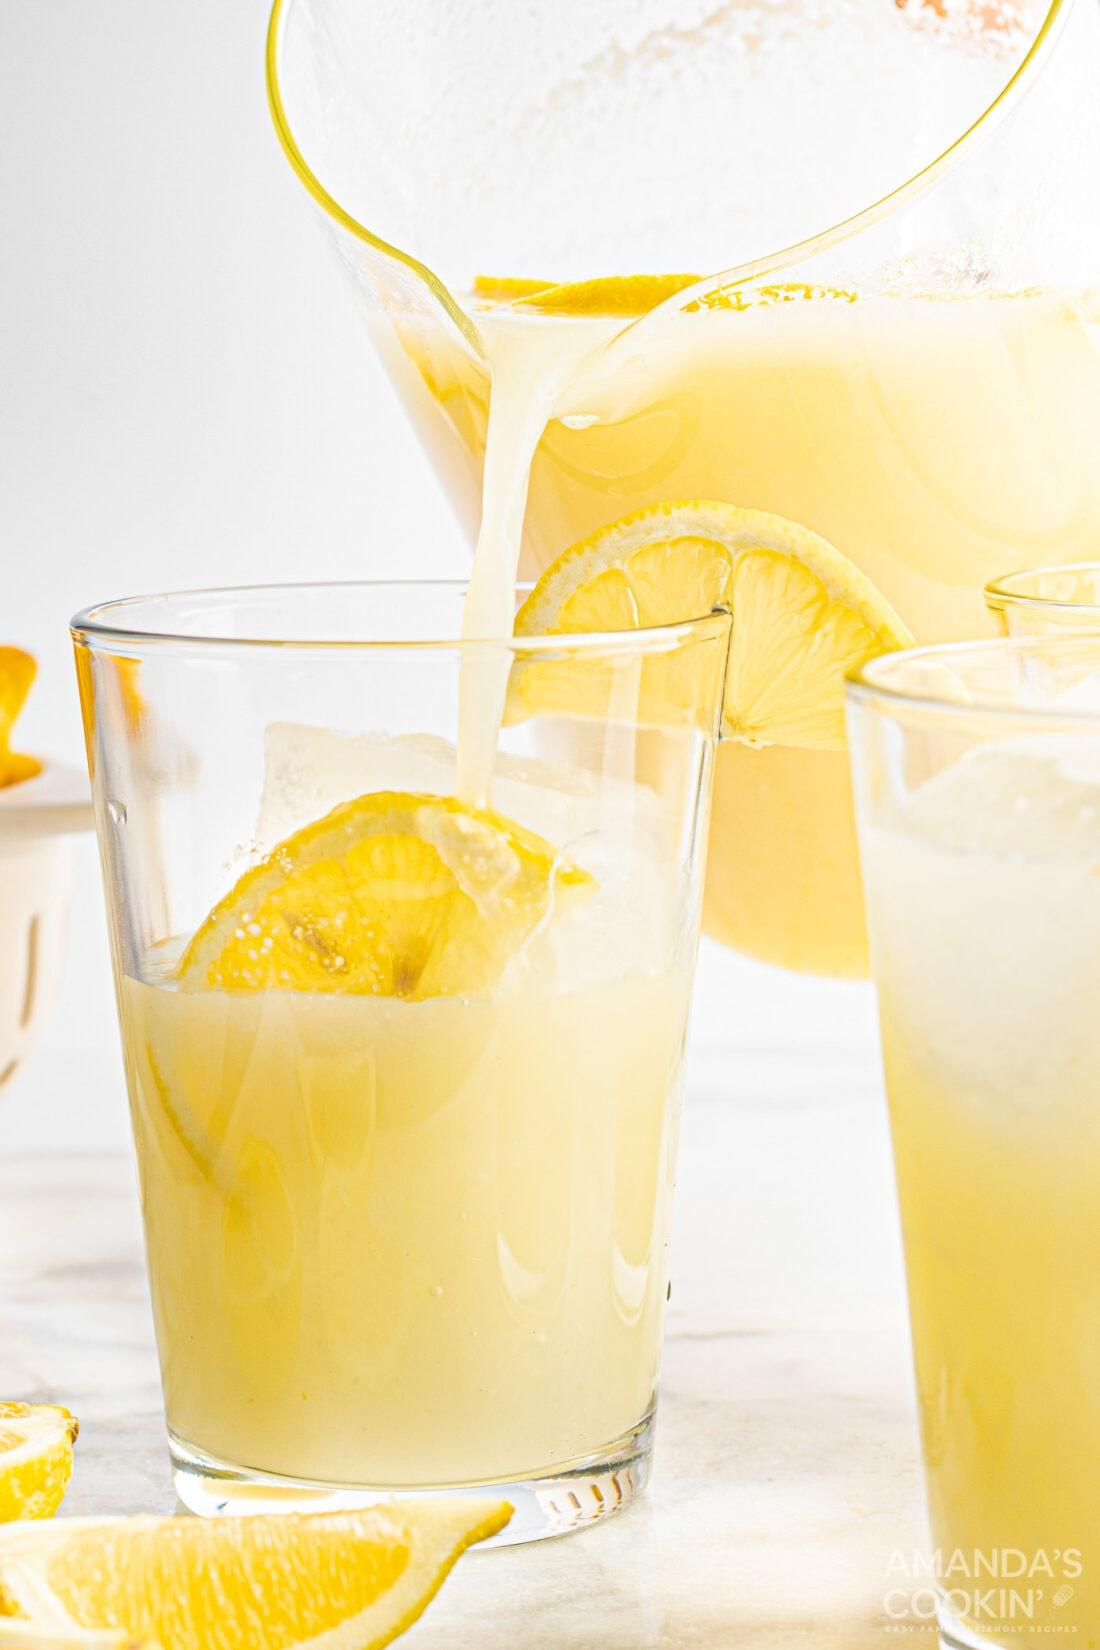 pouring a glass of Frozen Lemonade